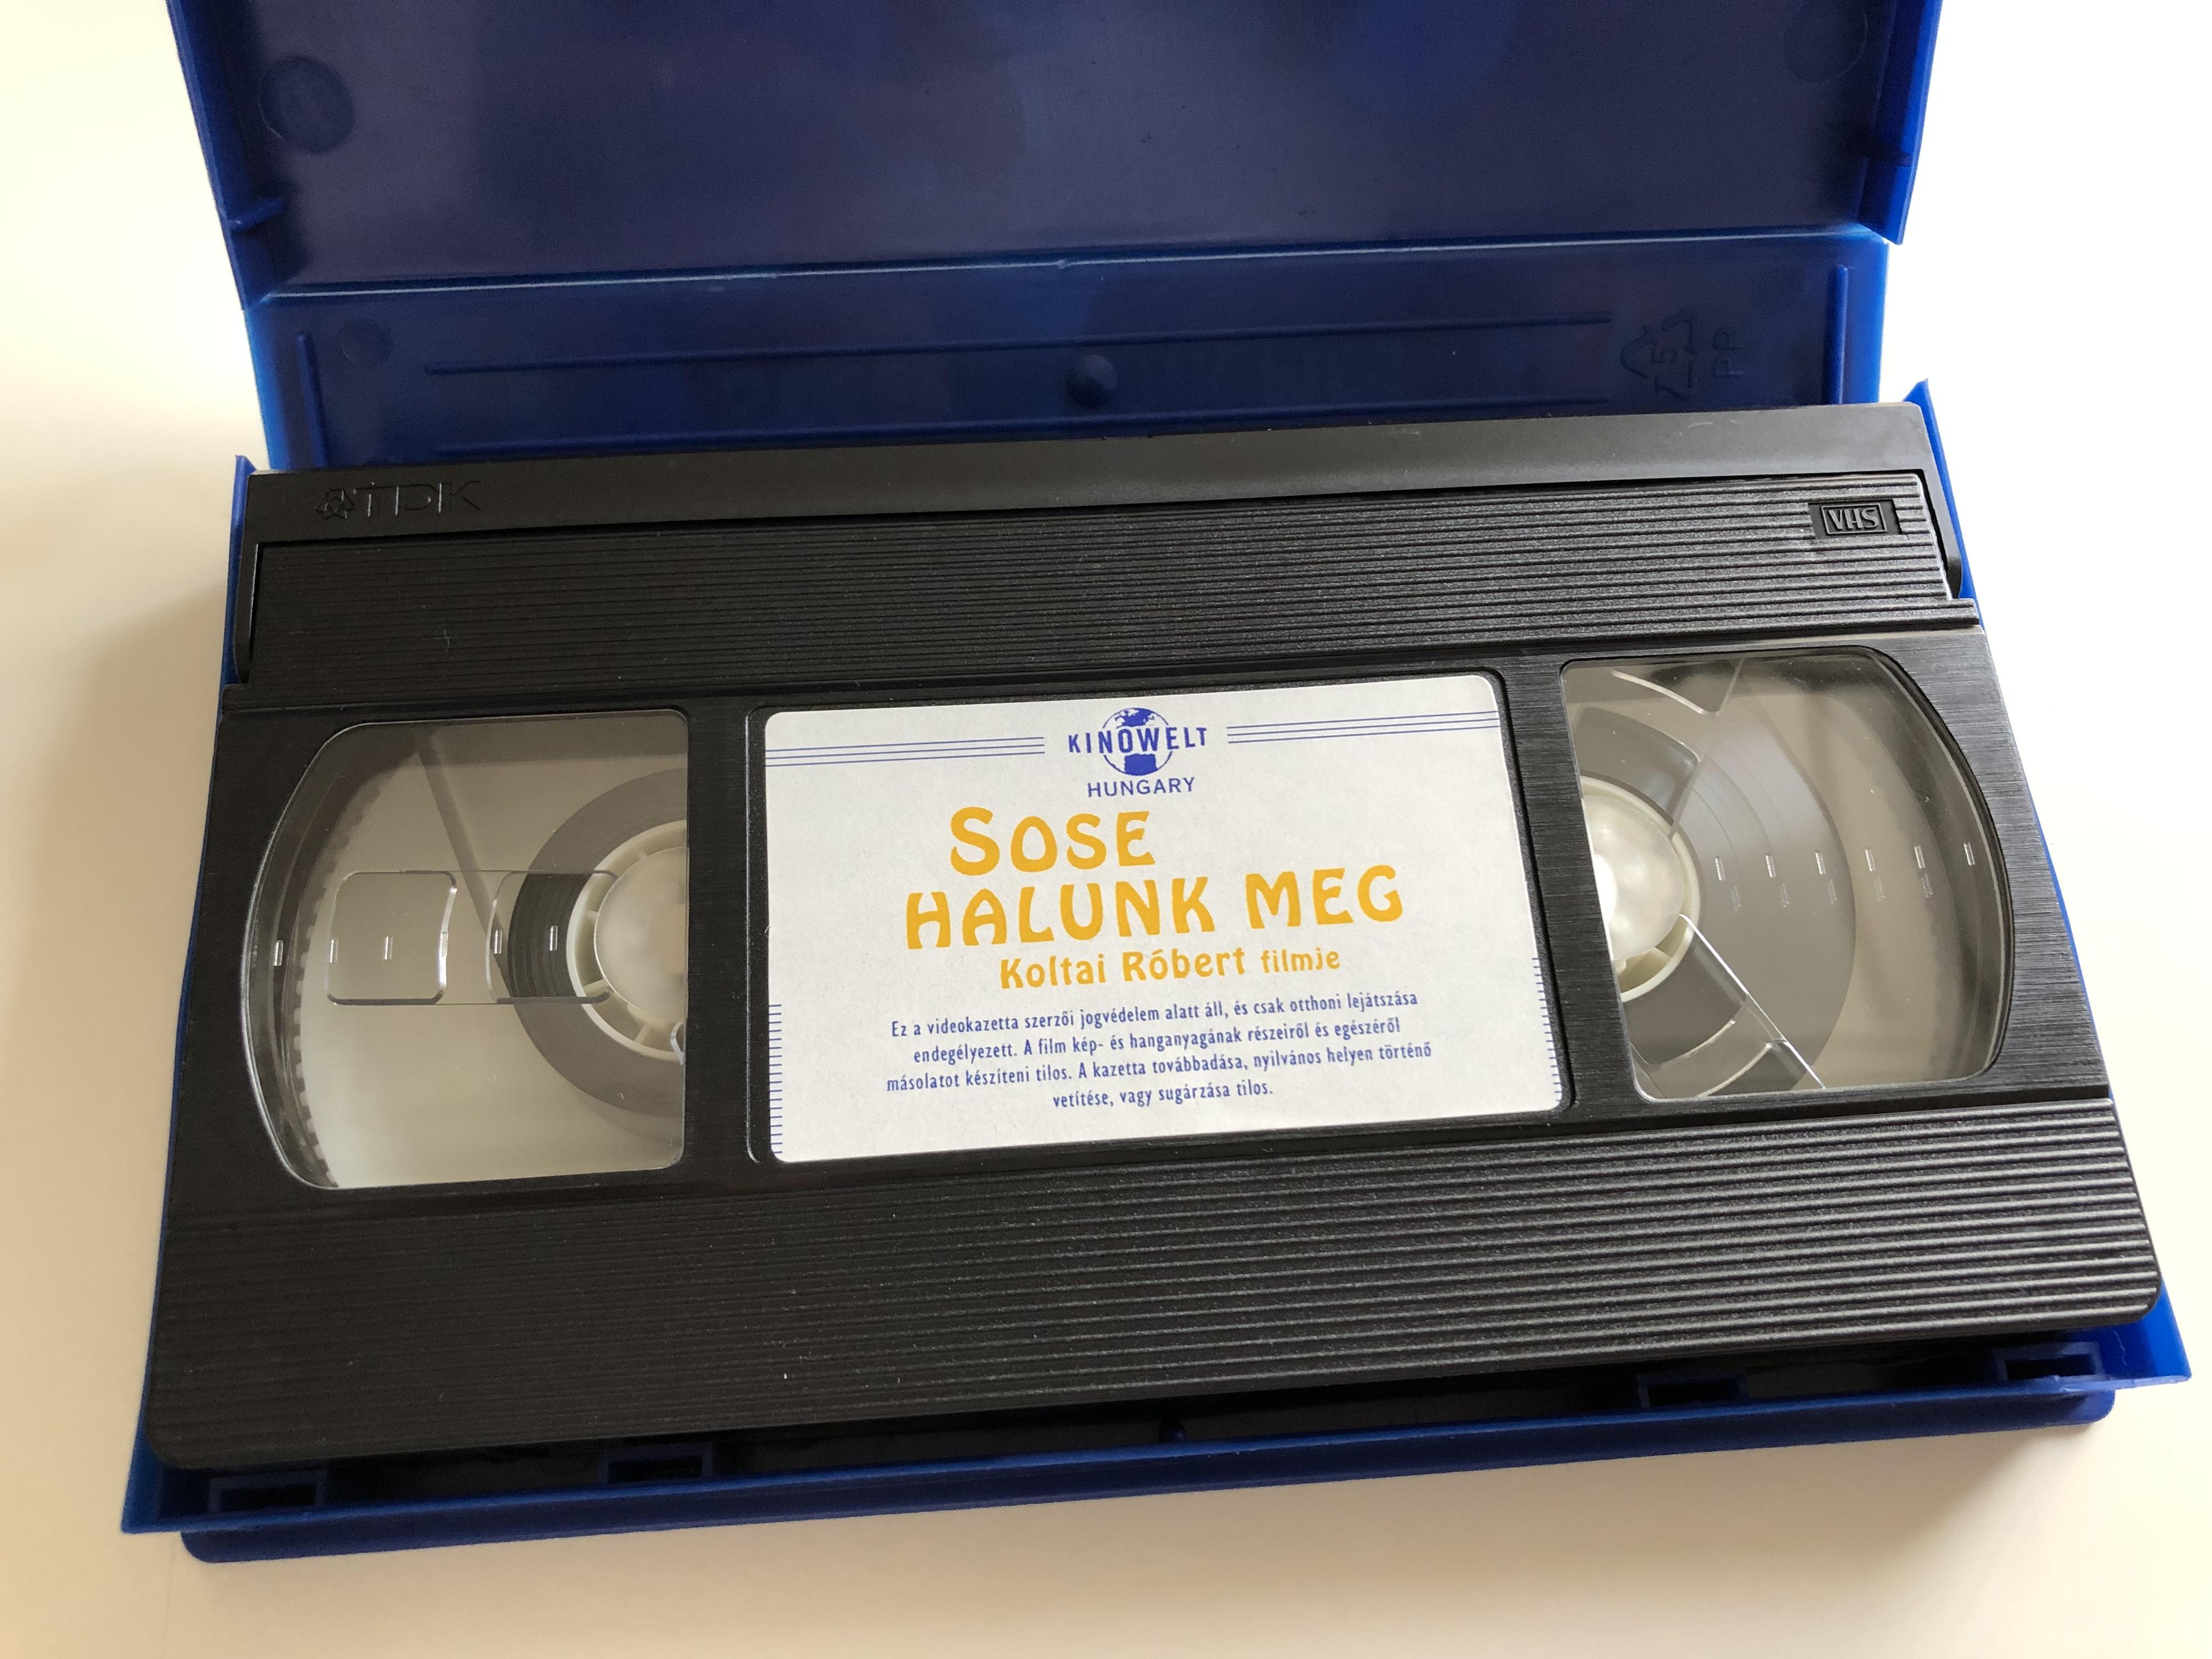 sose-halunk-meg-vhs-1992-directed-by-koltai-r-bert-starring-r-bert-koltai-mih-ly-szabados-g-bor-m-t-hungarian-comedy-4-.jpg